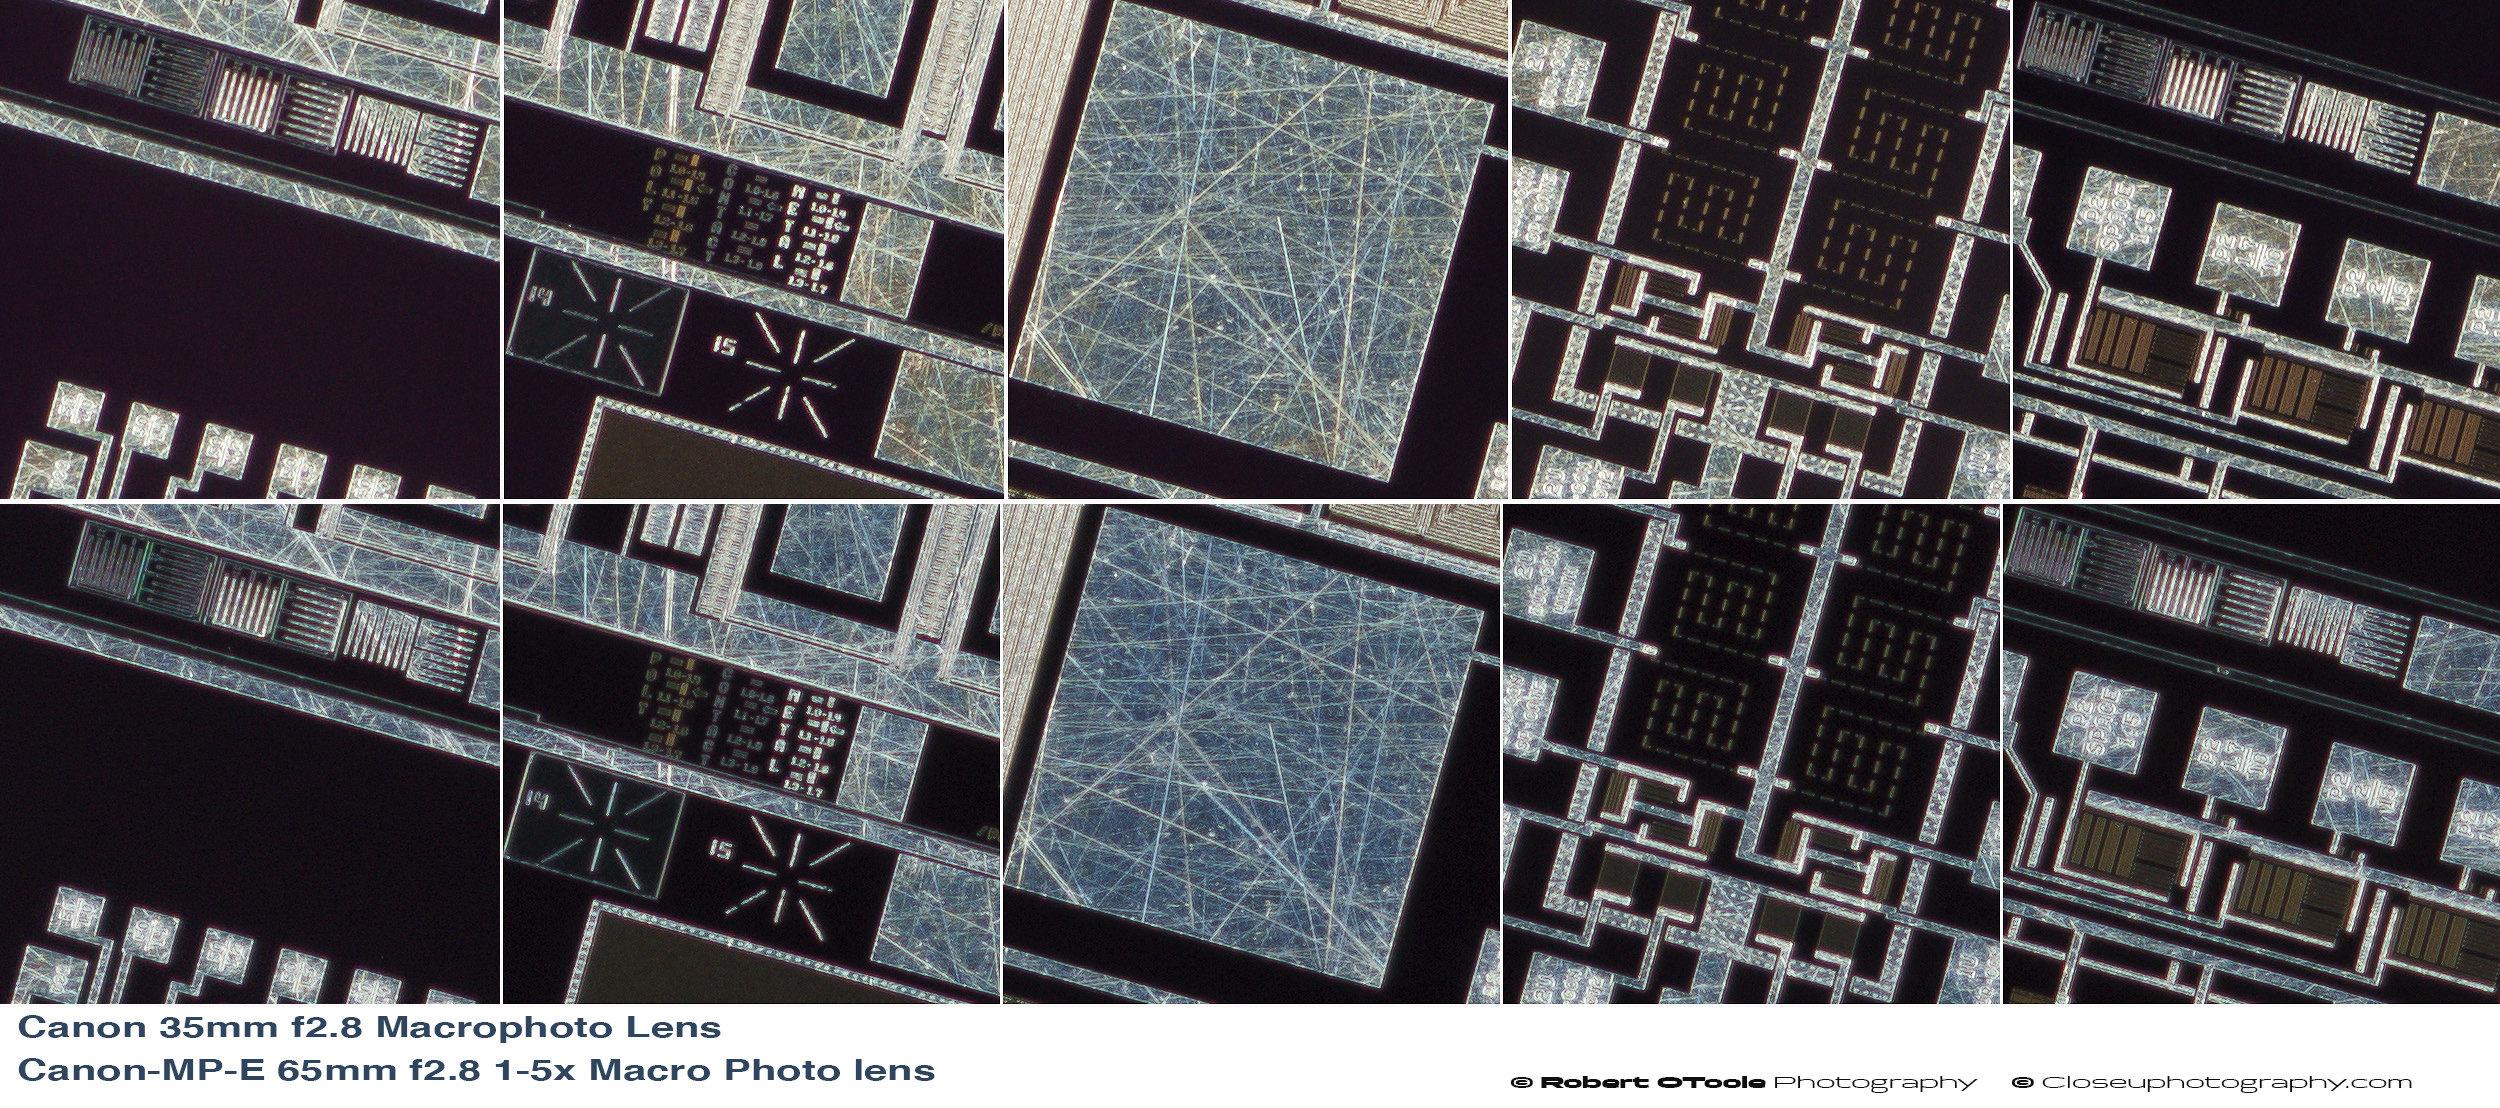 Canon-35mm-F2.8-Macrophoto-Lens-versus-Canon-MP-E-65mm-f2.8-1-5x-Macro-Photo-lens-100-percent-crops.jpg